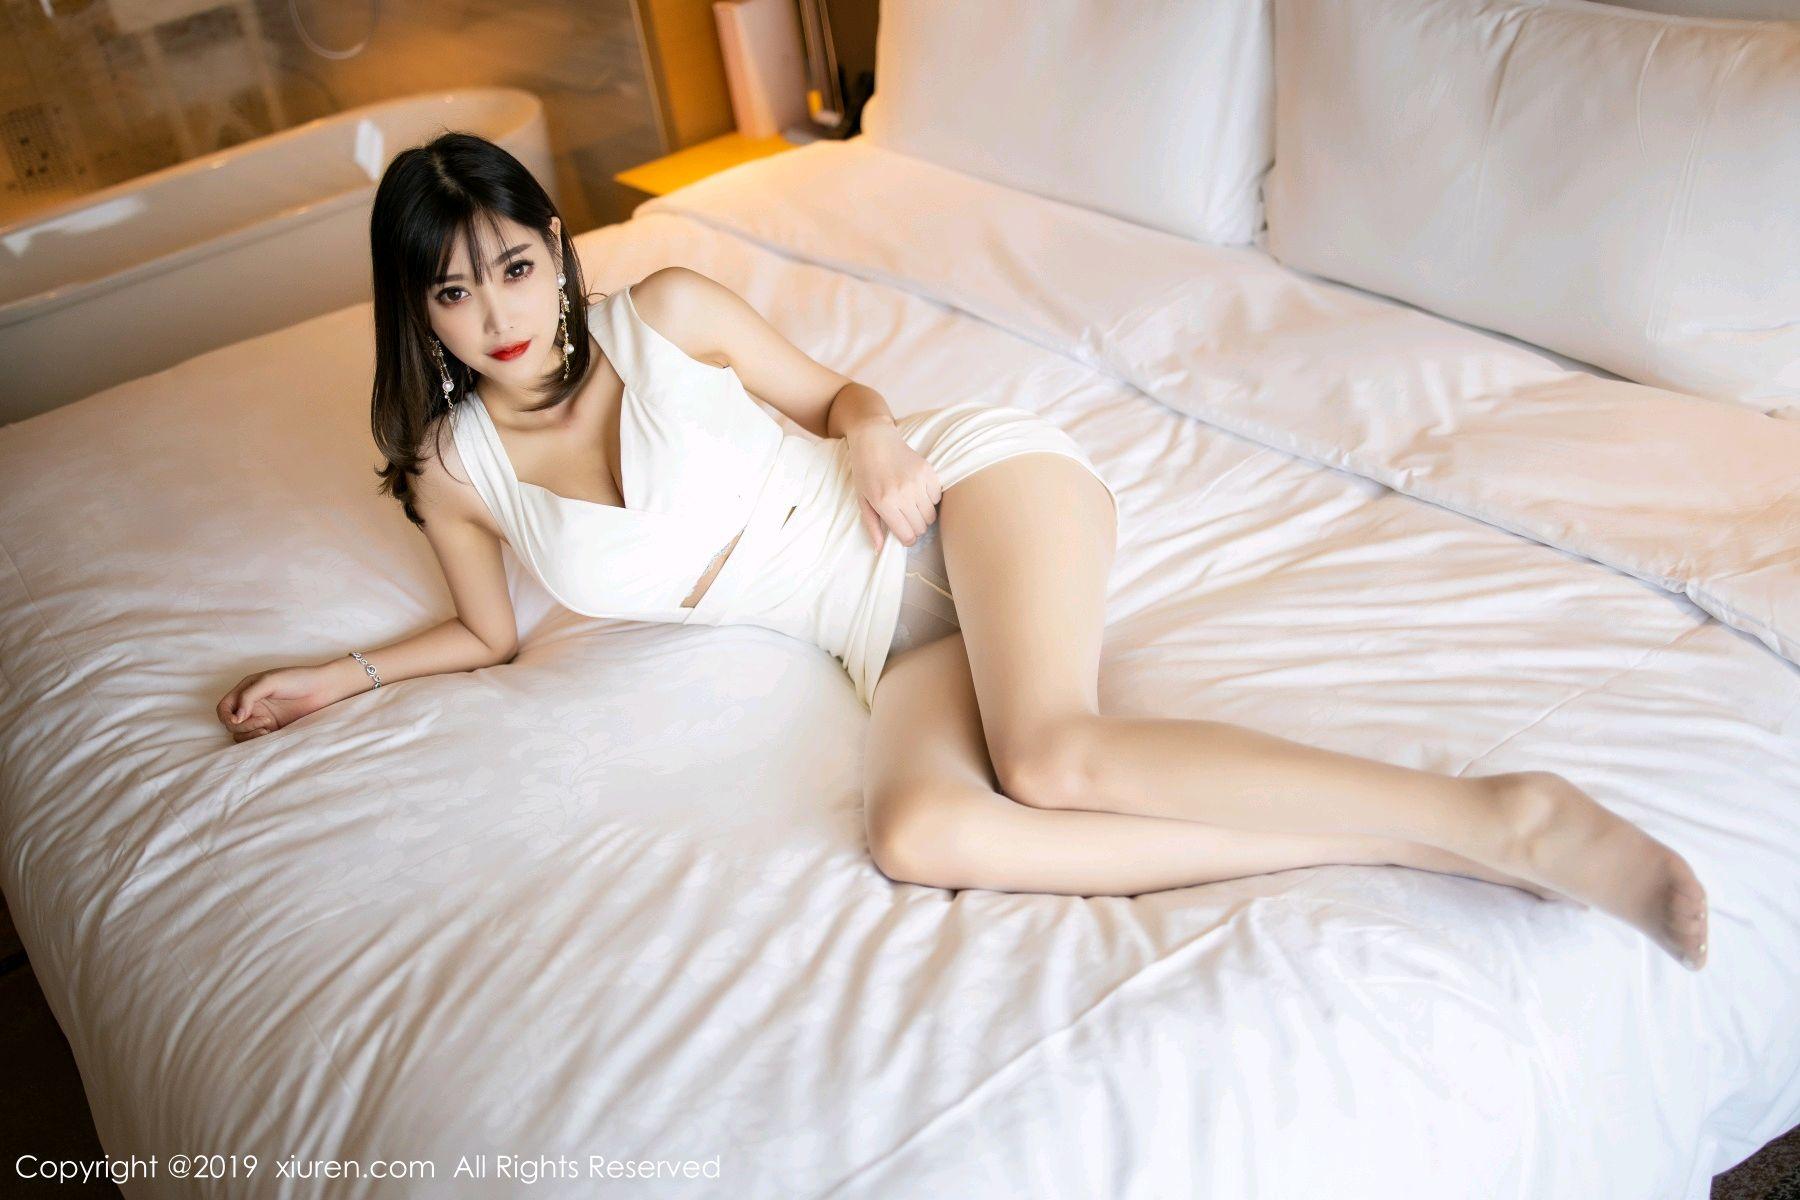 [XiuRen] Vol.1695 Yang Chen Chen 43P, Foot, Tall, Underwear, Xiuren, Yang Chen Chen